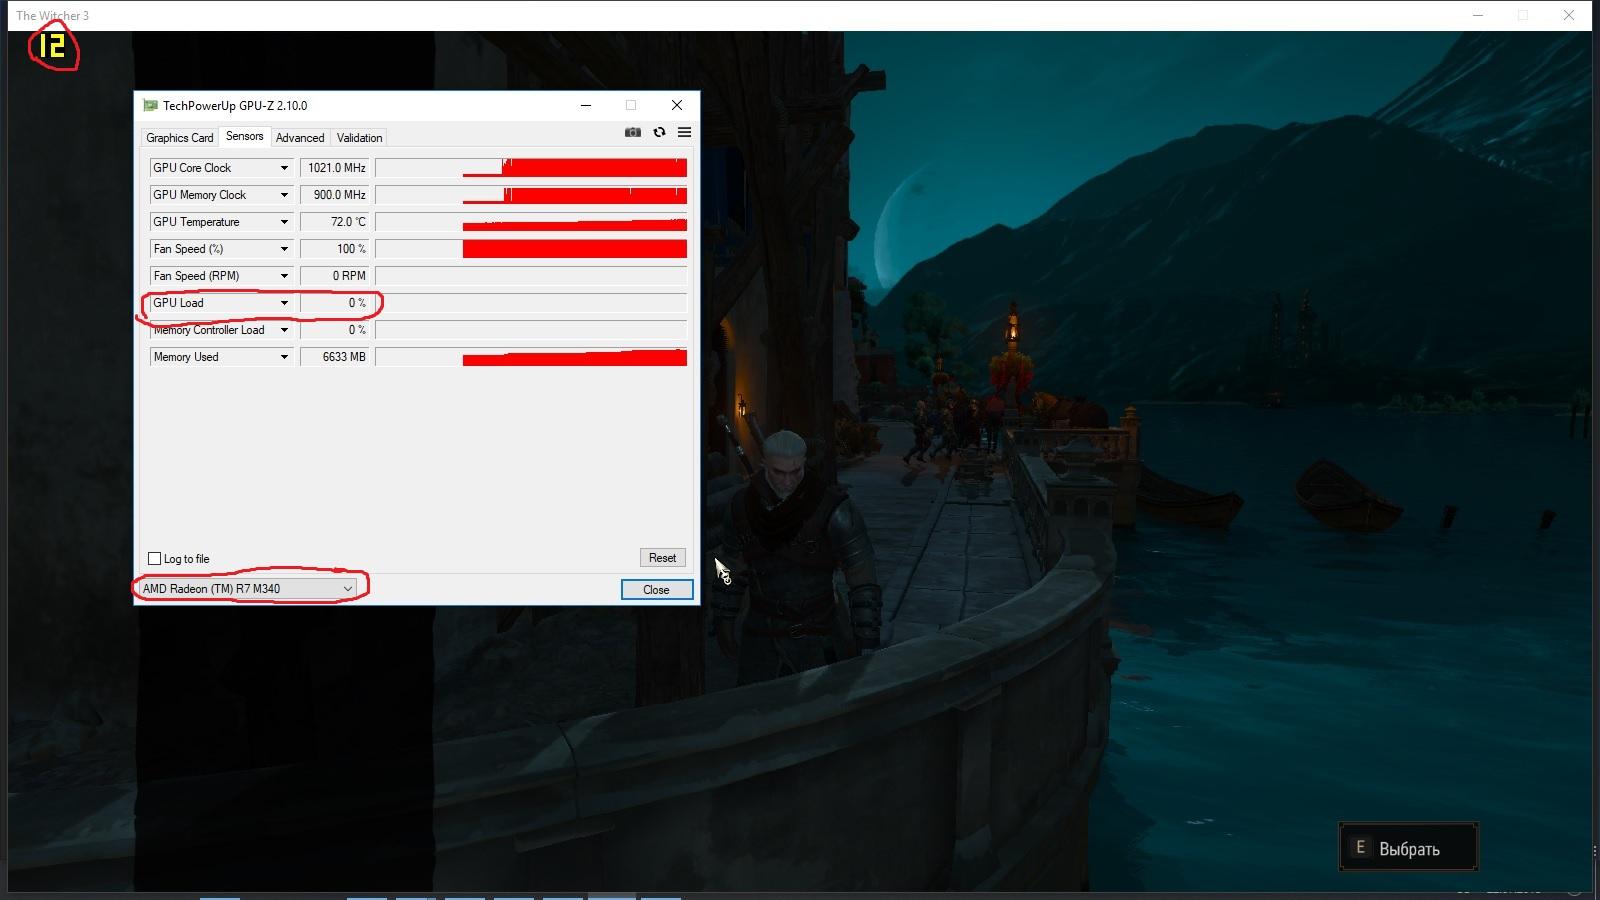 Amd Radeon R7 M340 Games List